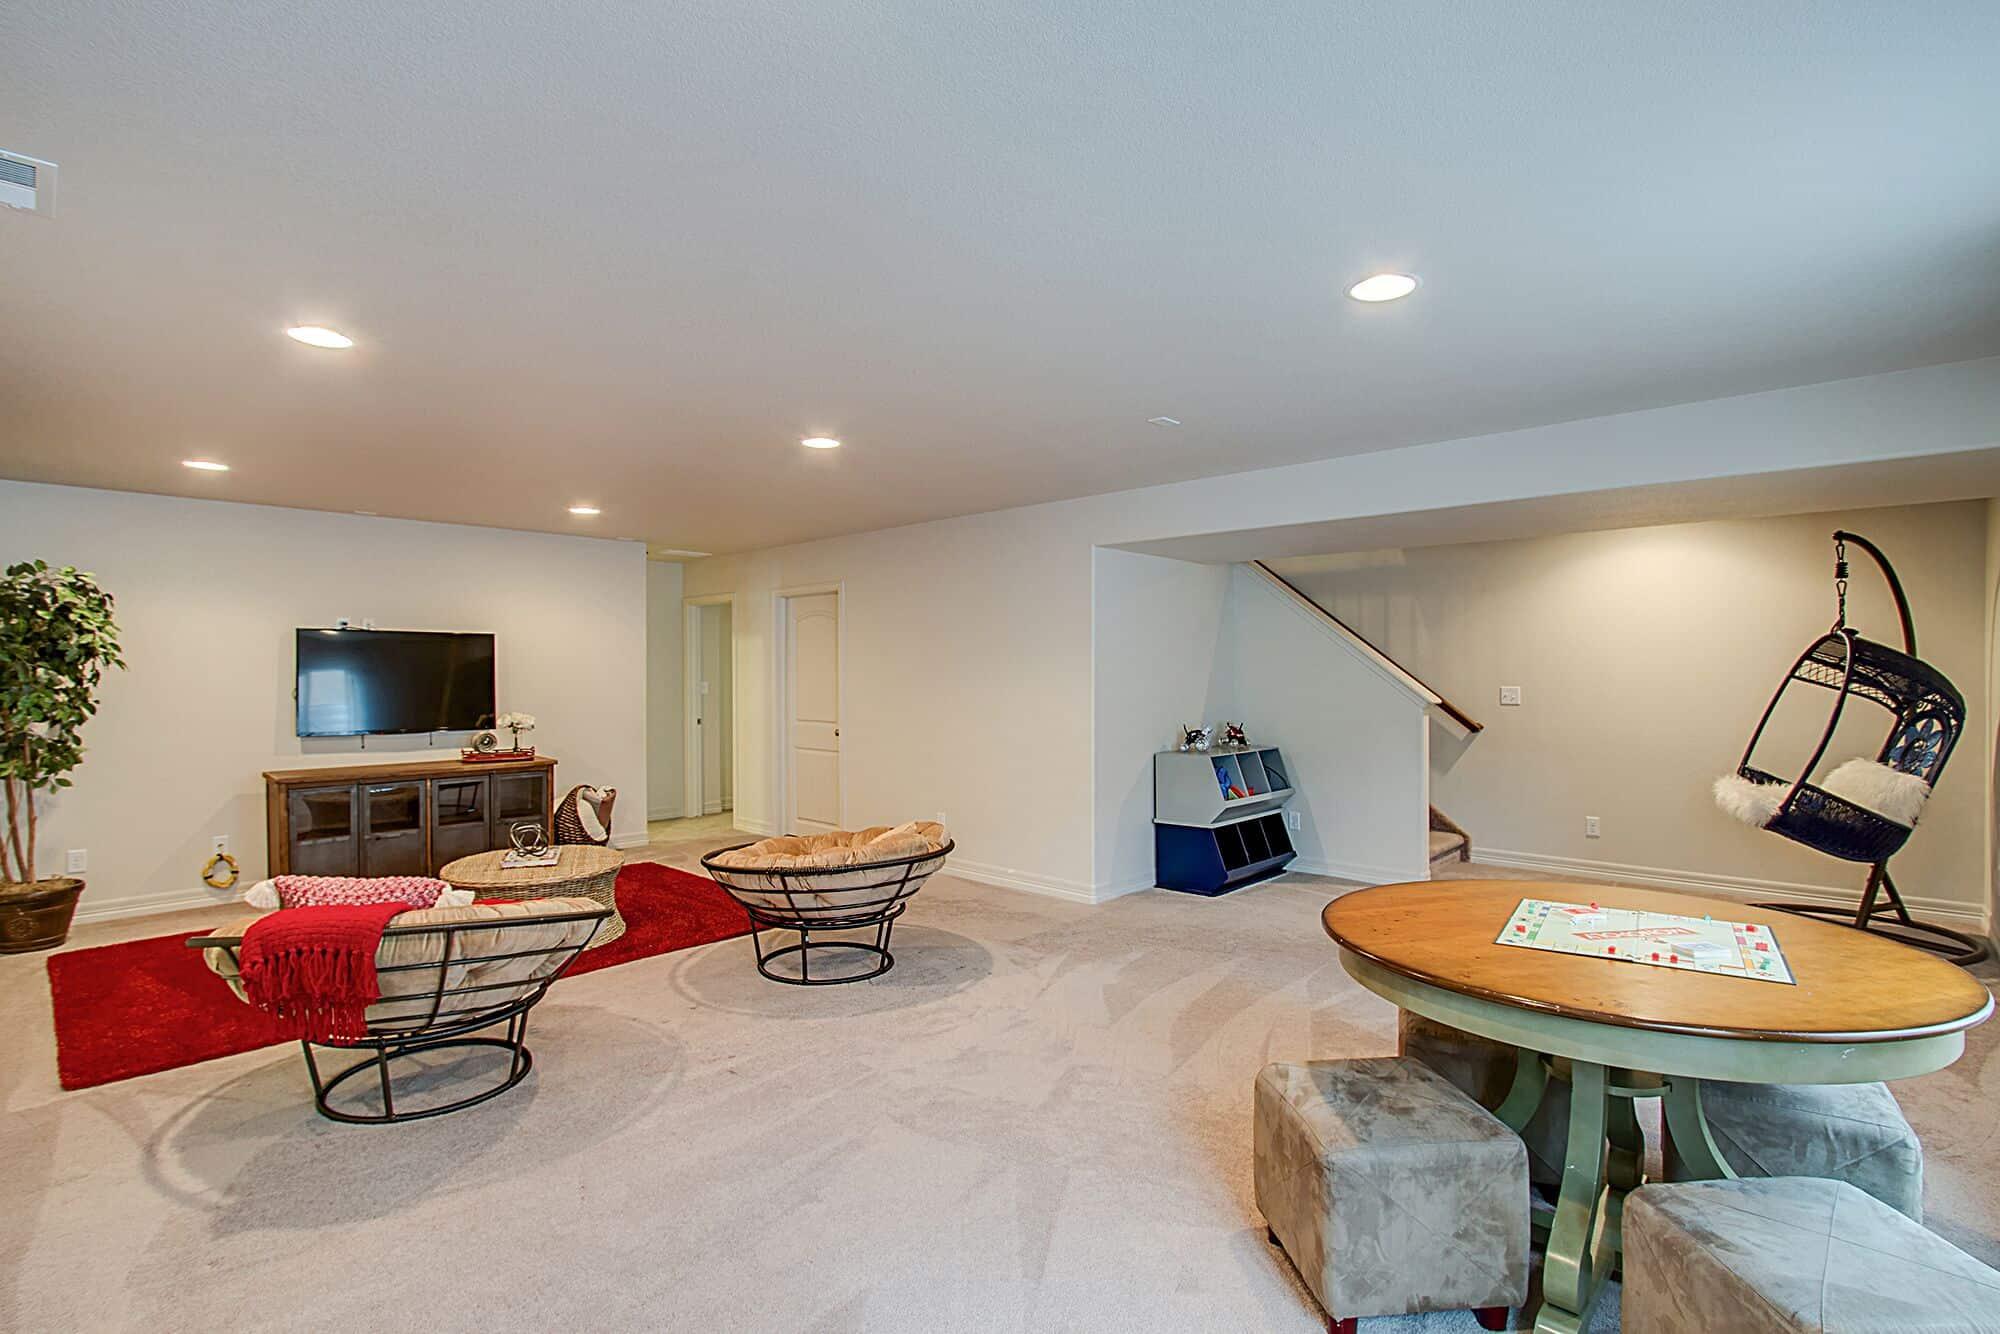 Basement Recreation Room